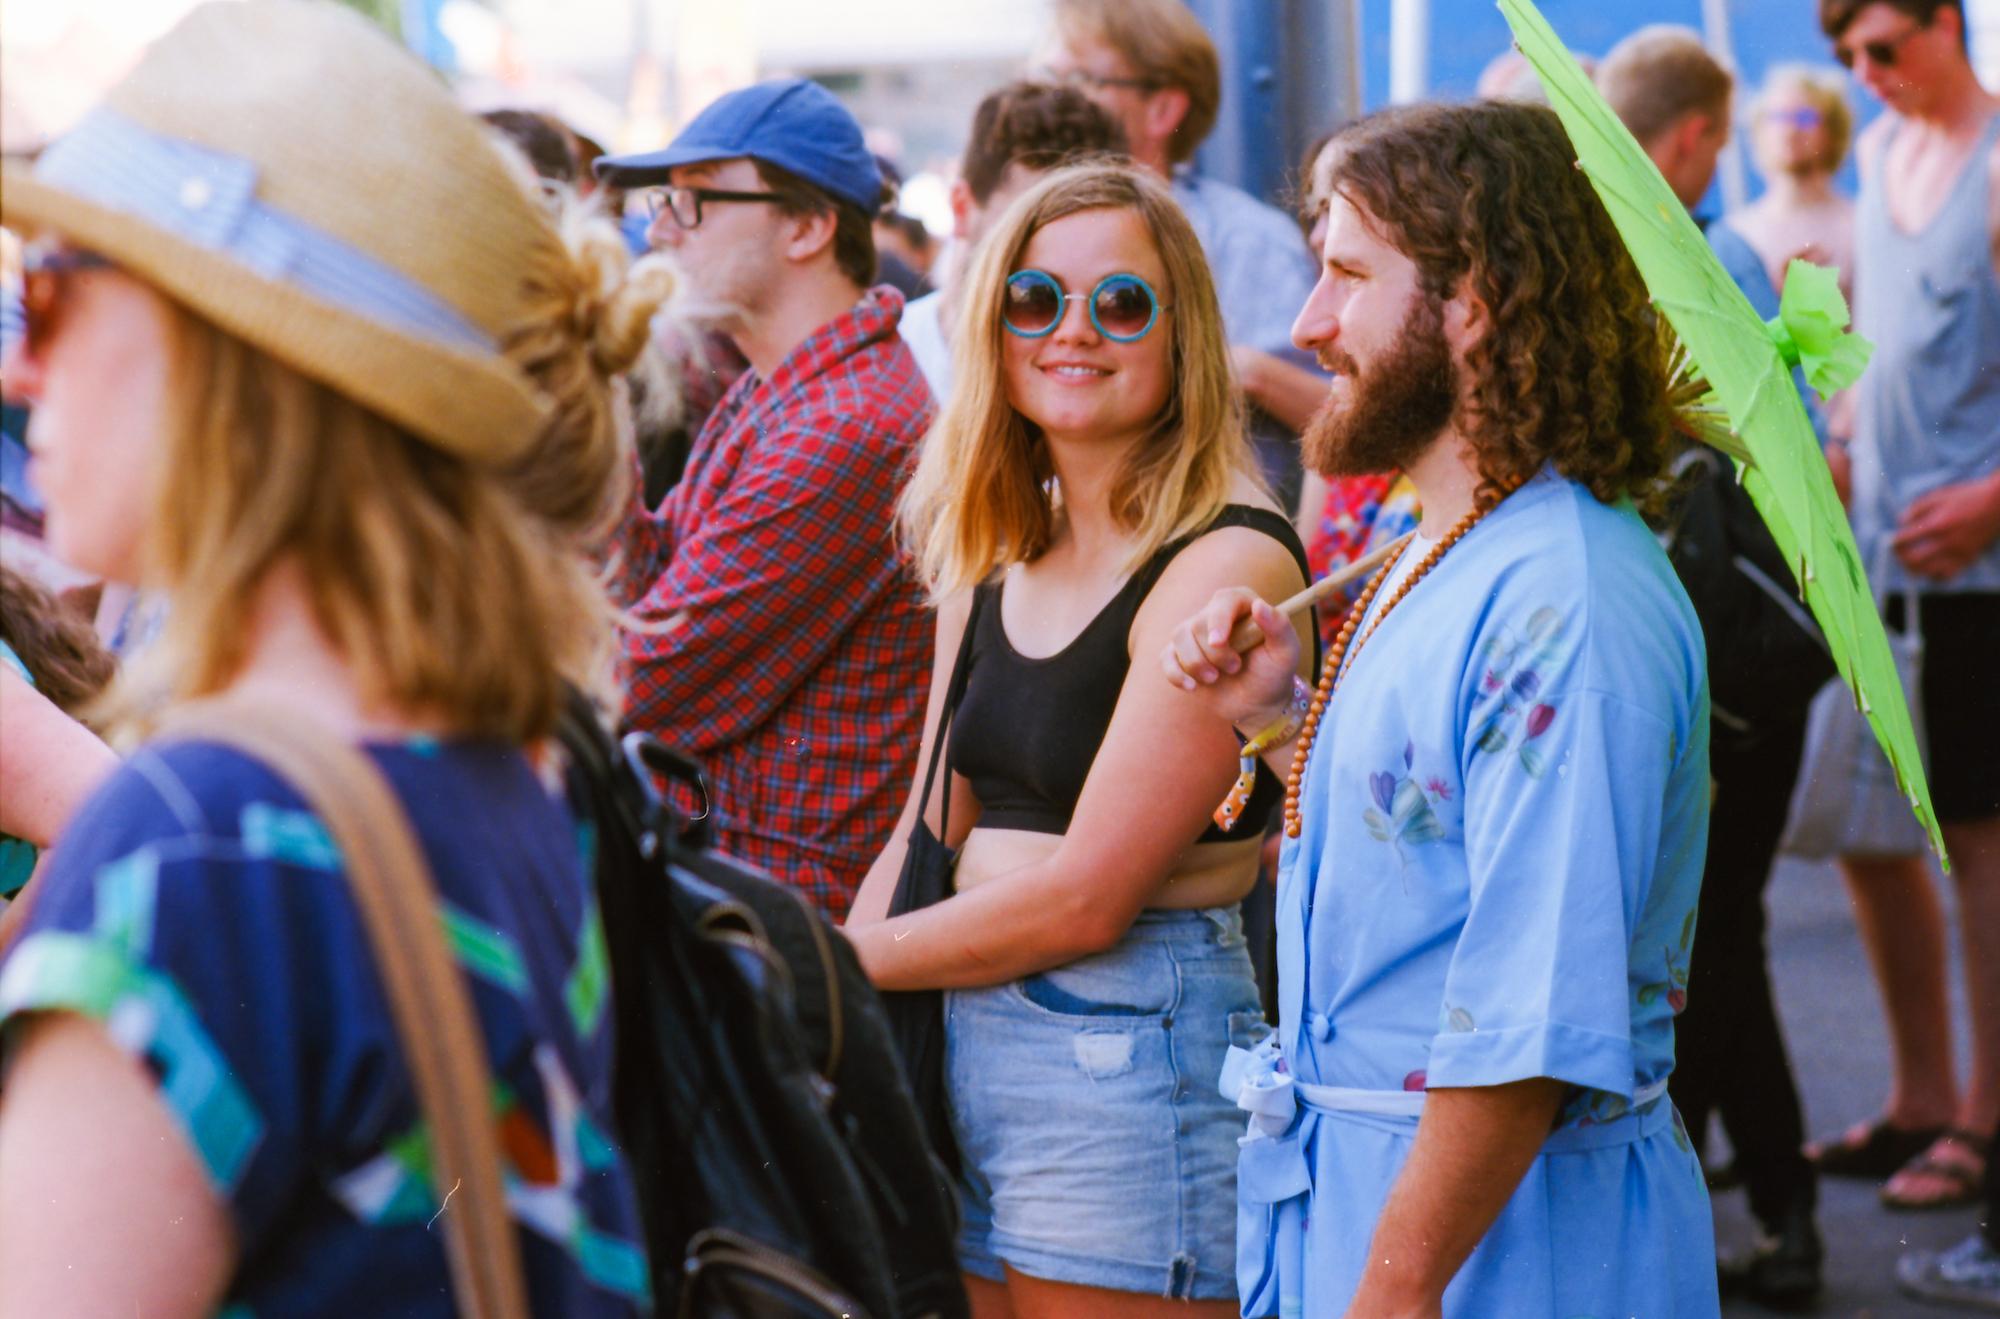 Newtown Festival - Nikon FE2, Nikkor 85mm f2, Ektar 100 35mm film